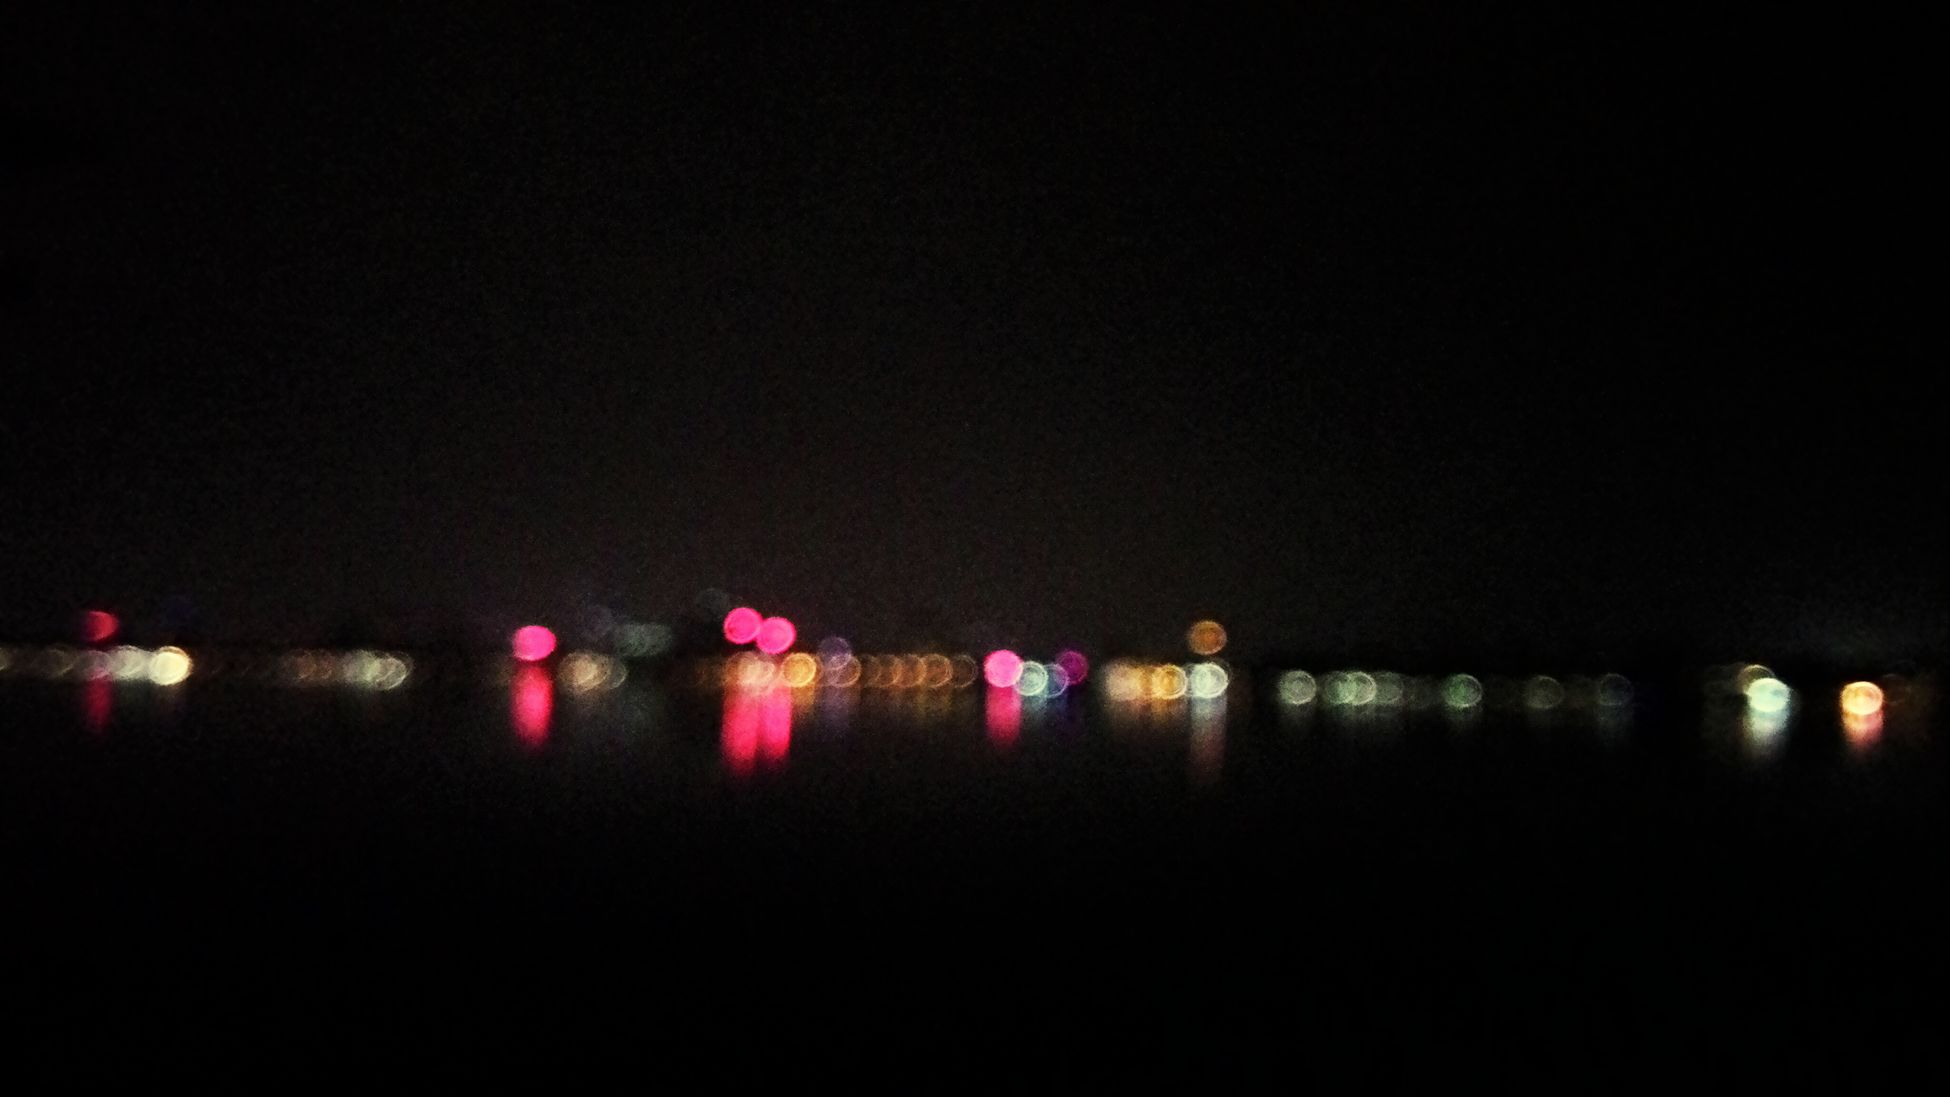 Hồ Tây blur